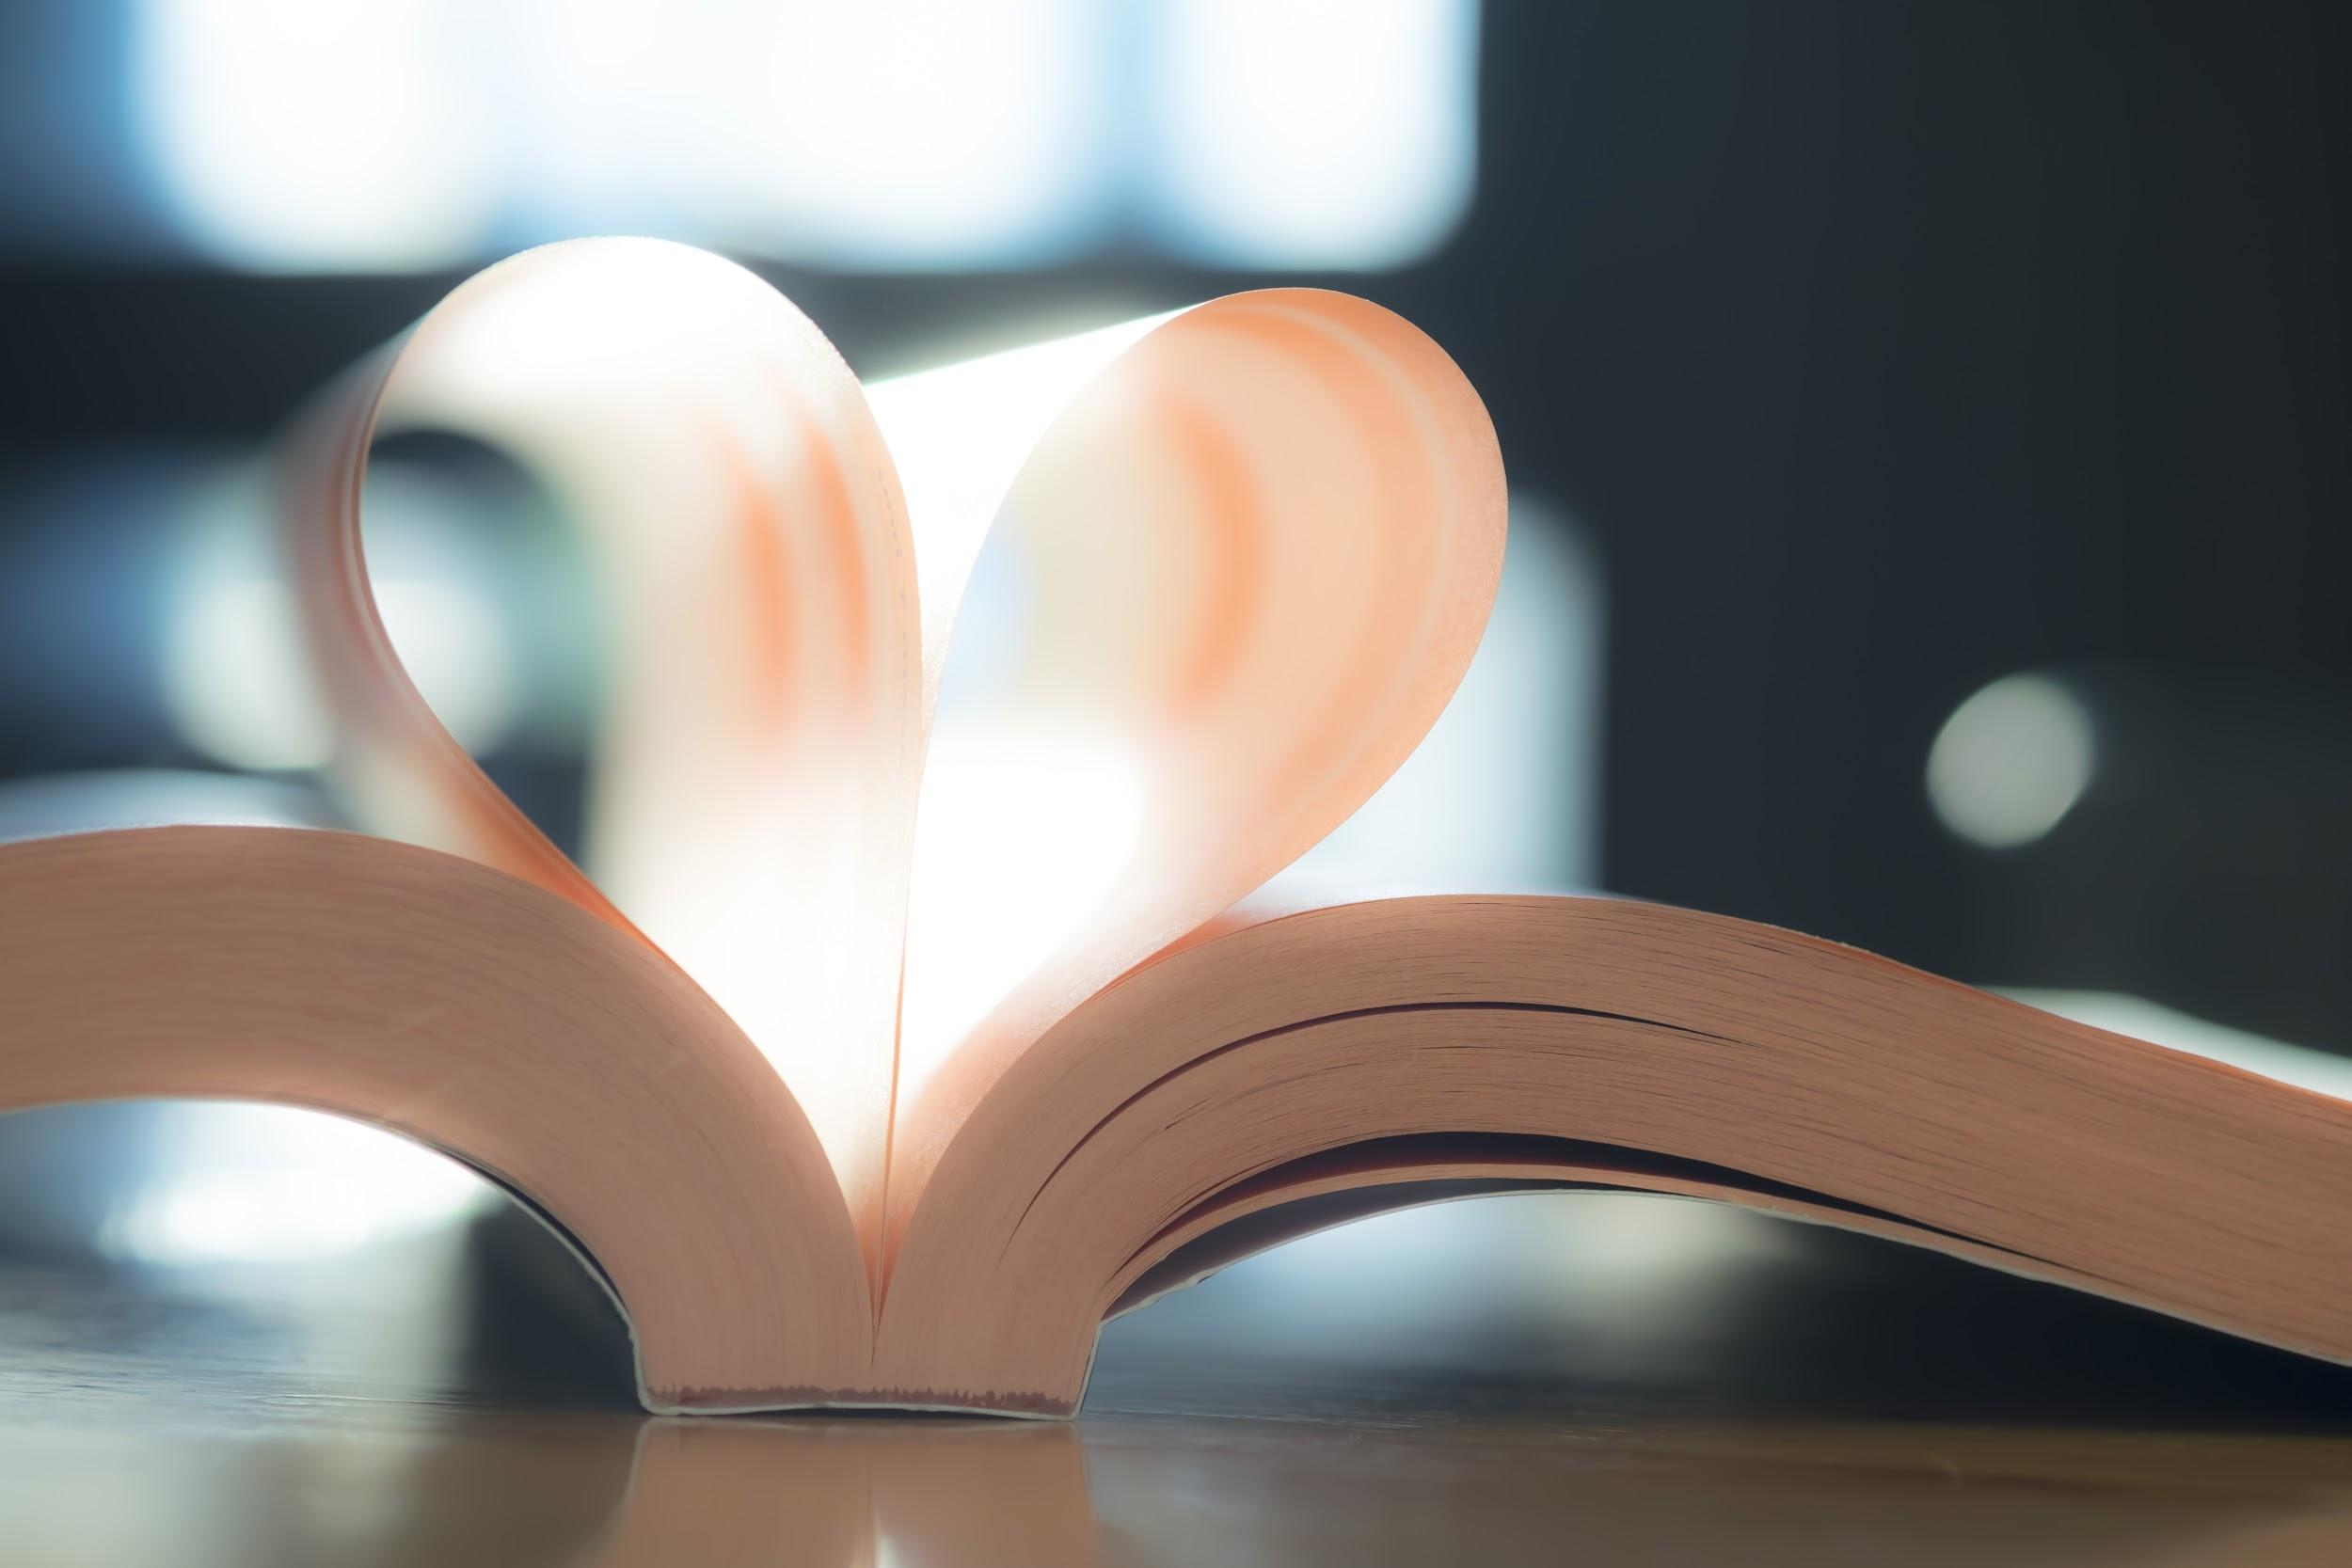 Poesia infantil: leitura que encanta